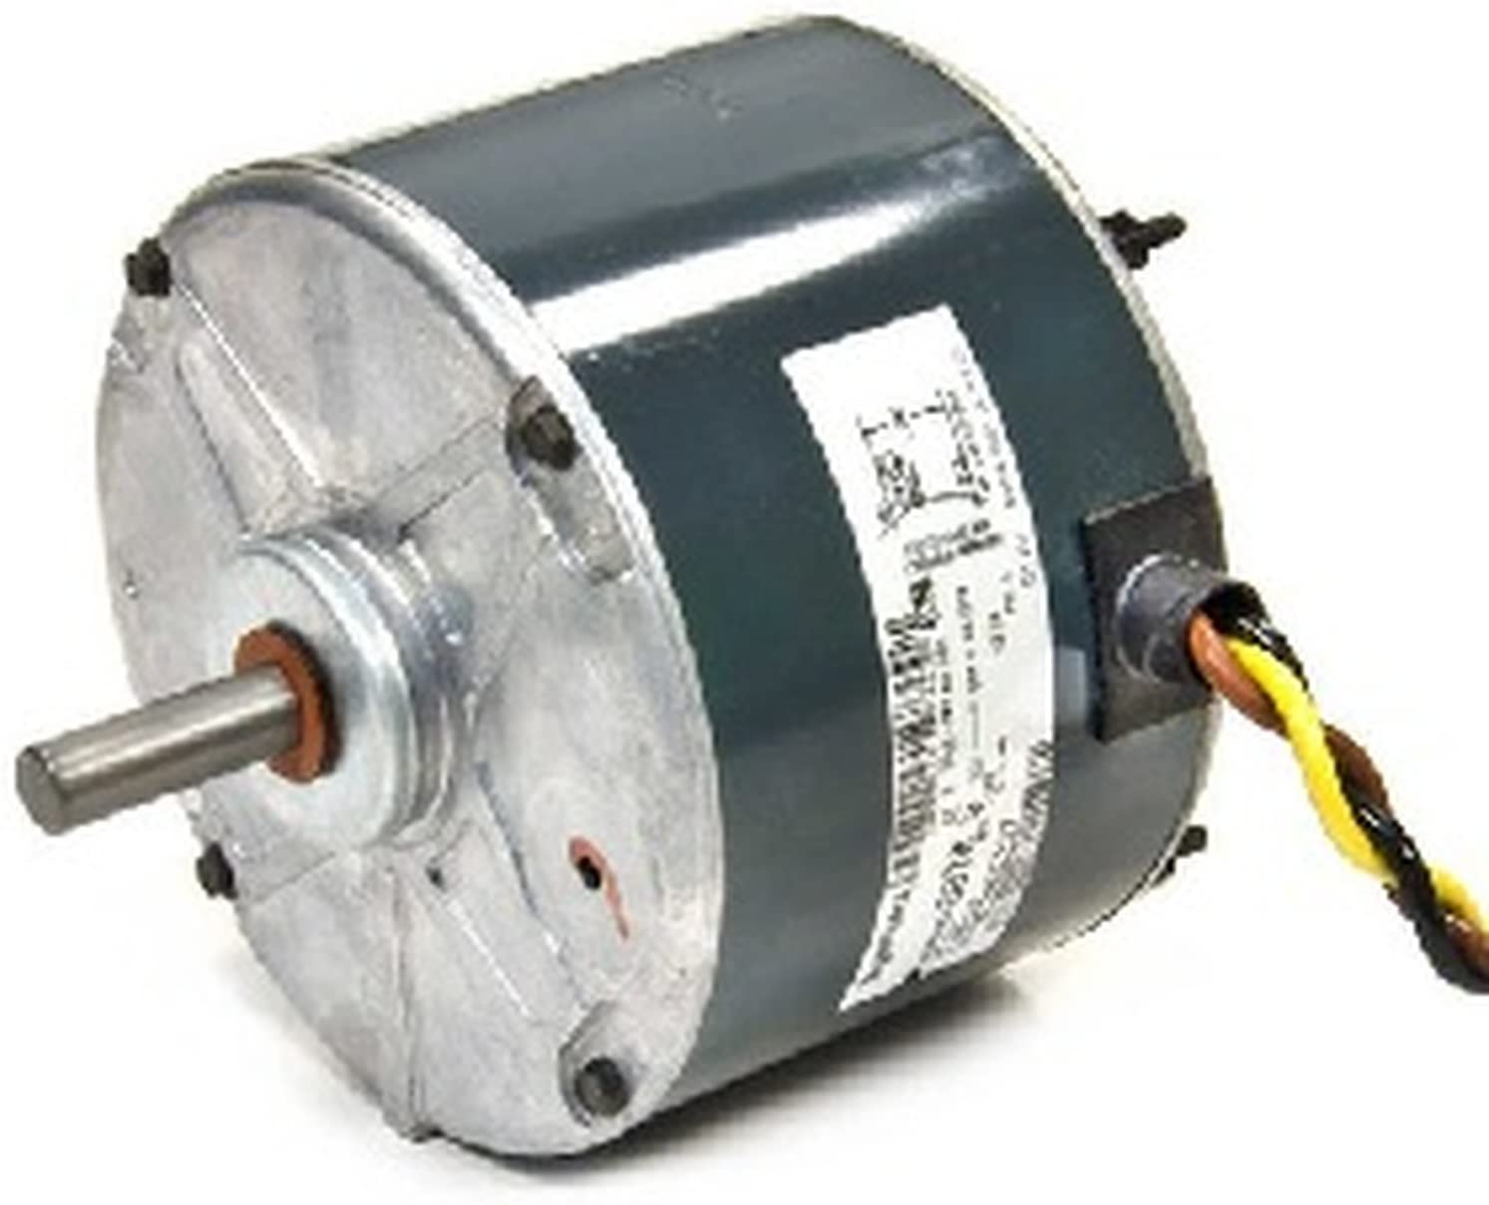 OEM Upgraded Carrier Bryant Payne 1/6 HP 230v Condenser Fan Motor HC33GE208